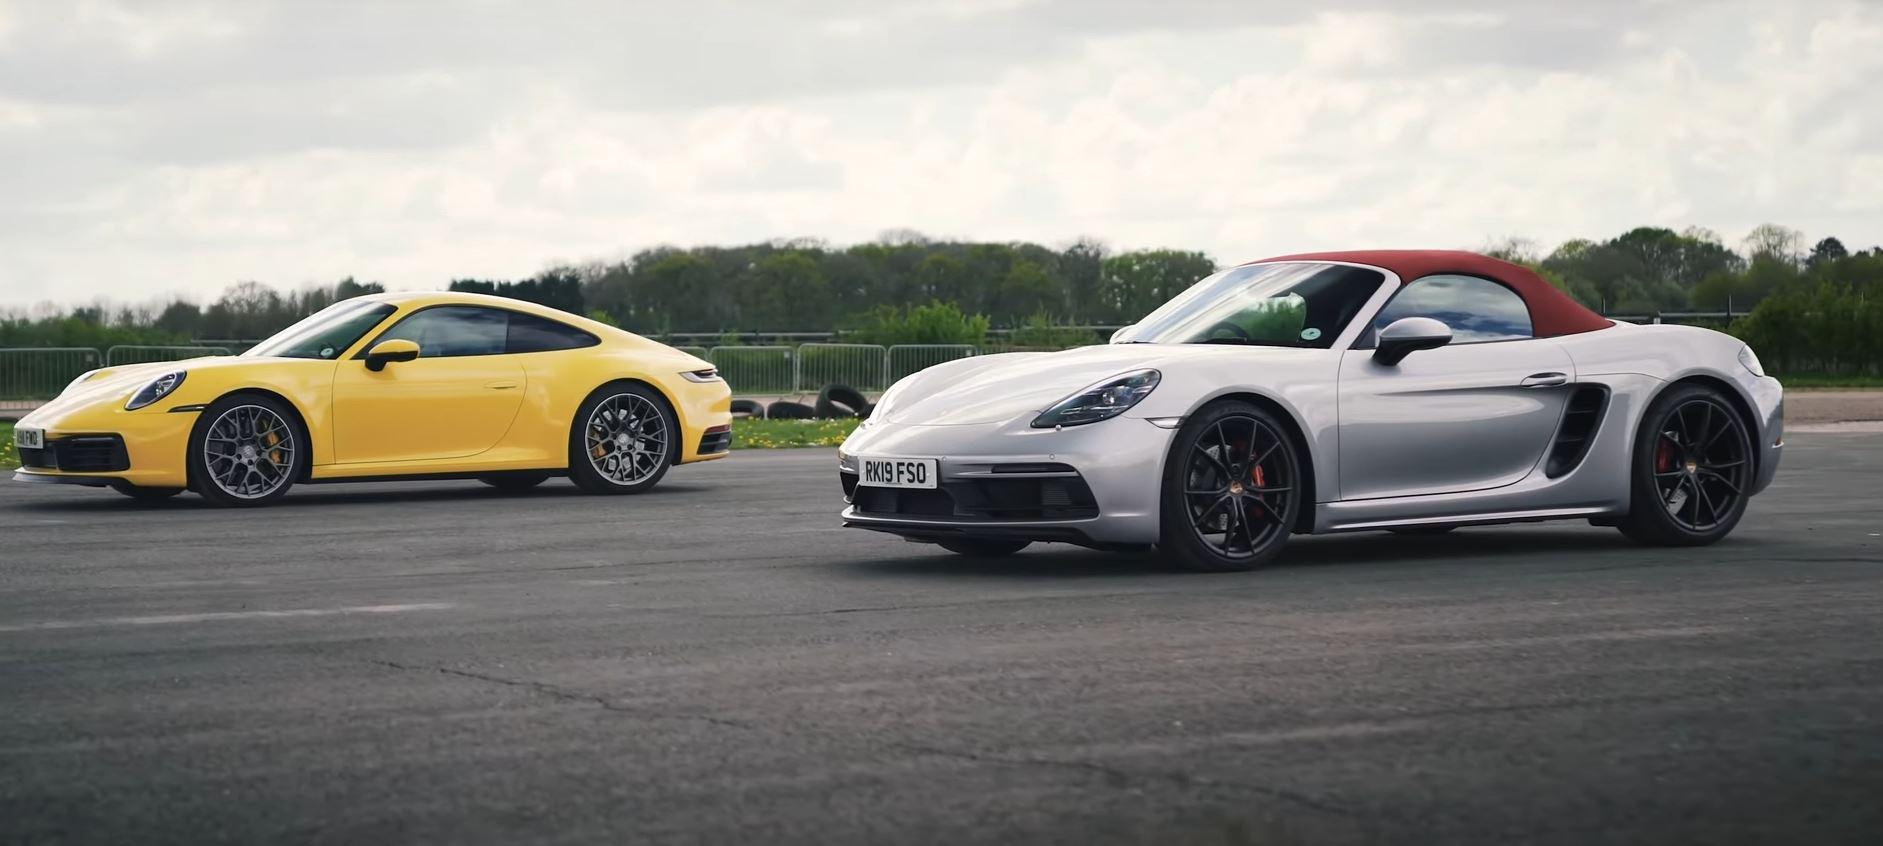 UPDATE: RWB 2020 Porsche 911 Looks Way Too Fat, Has Rear